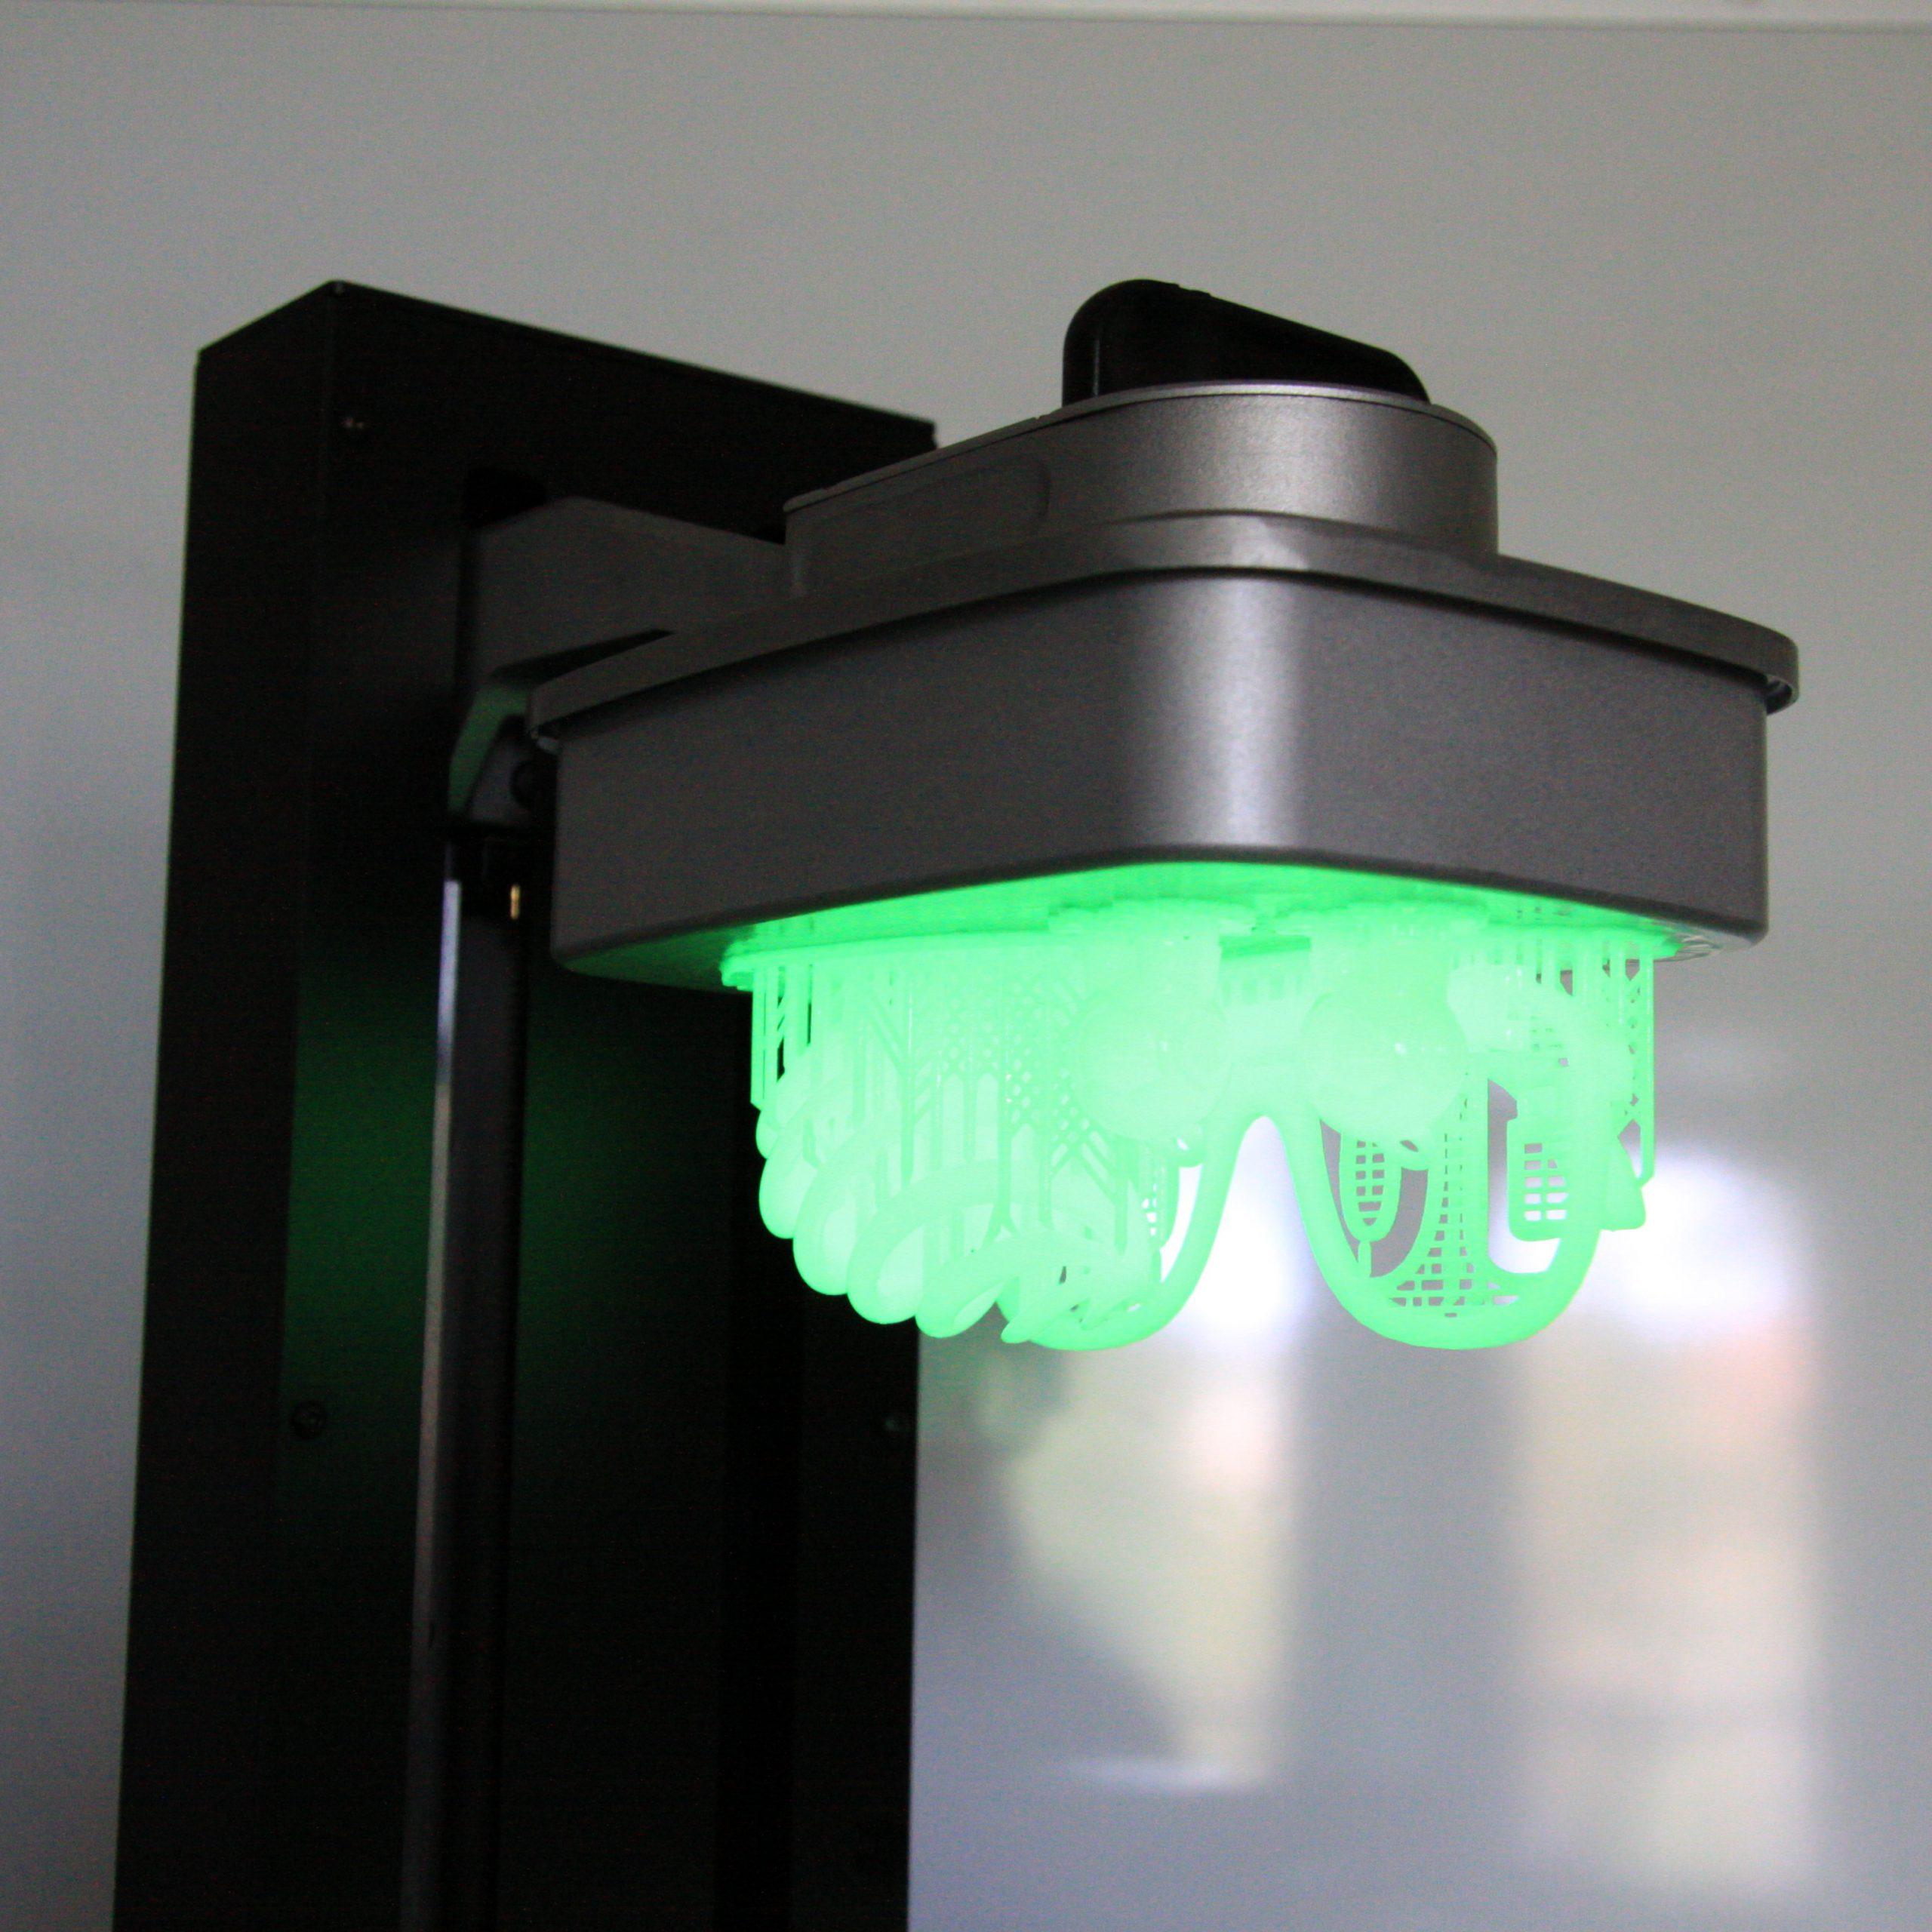 liqcreate hazard glow moonray sprintray compatible creative glow in the dark gitd resin high quality